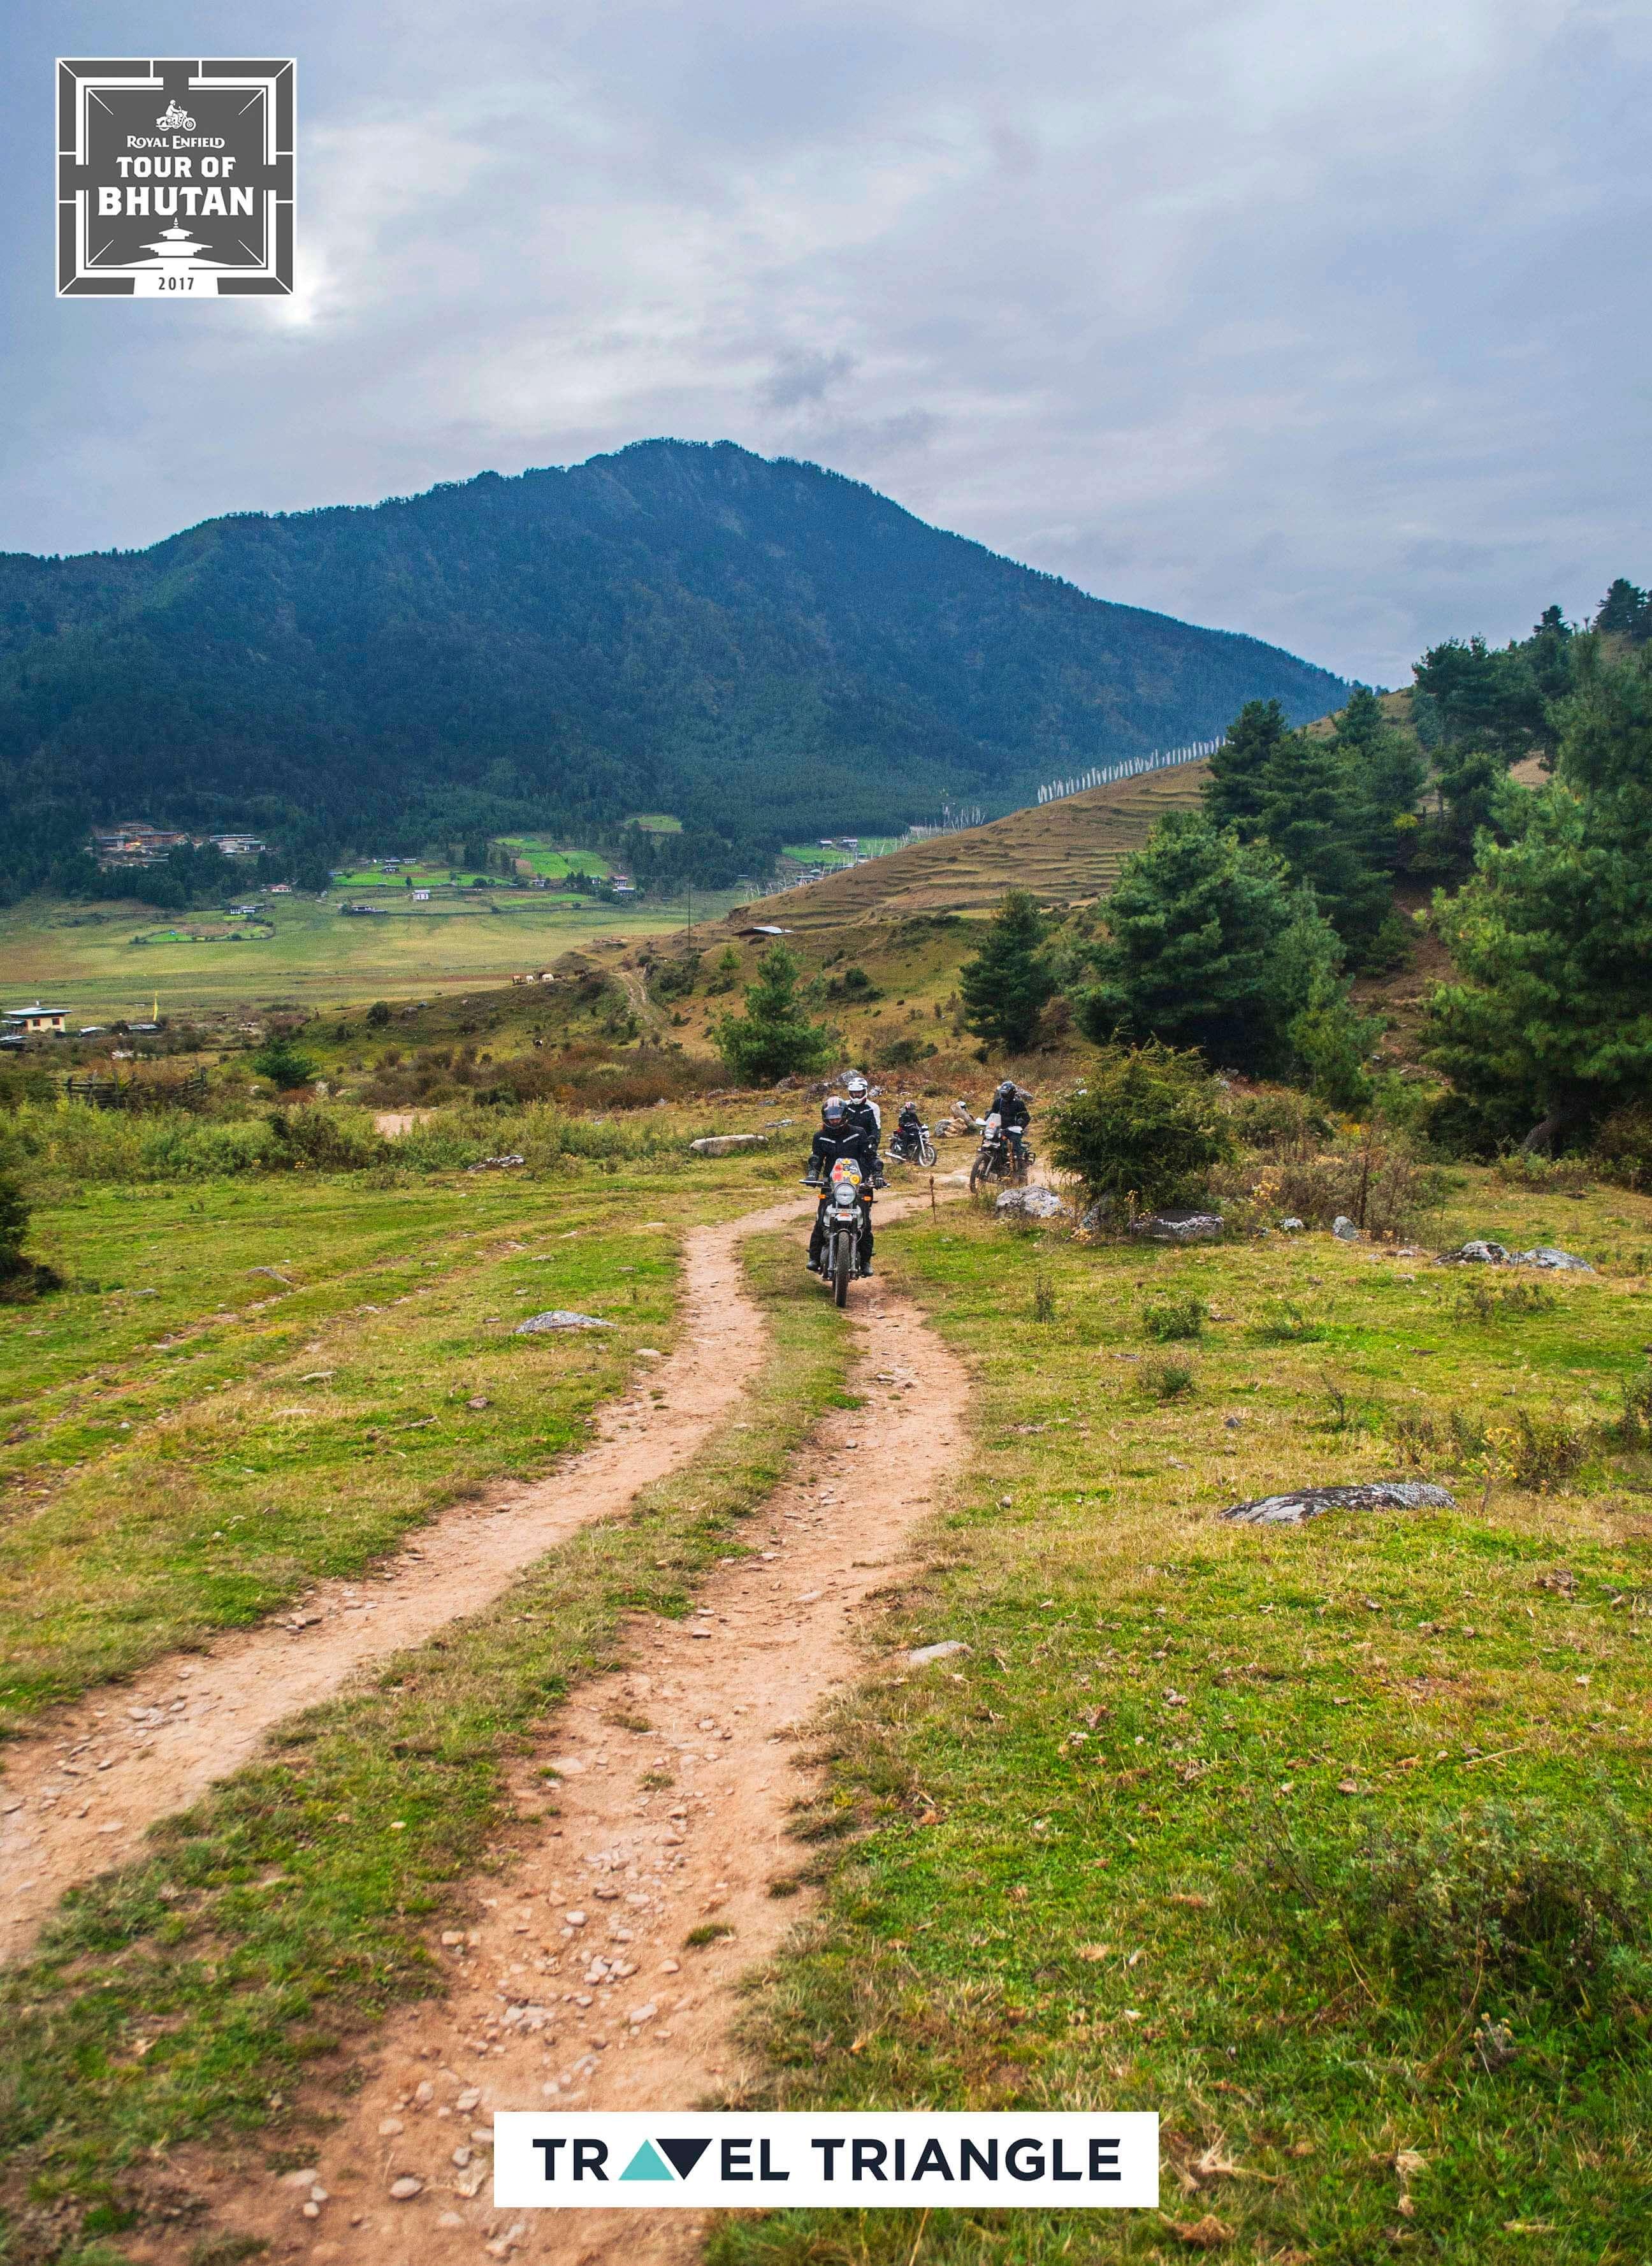 Punakha to Phobjikha: offroading in farms, hills